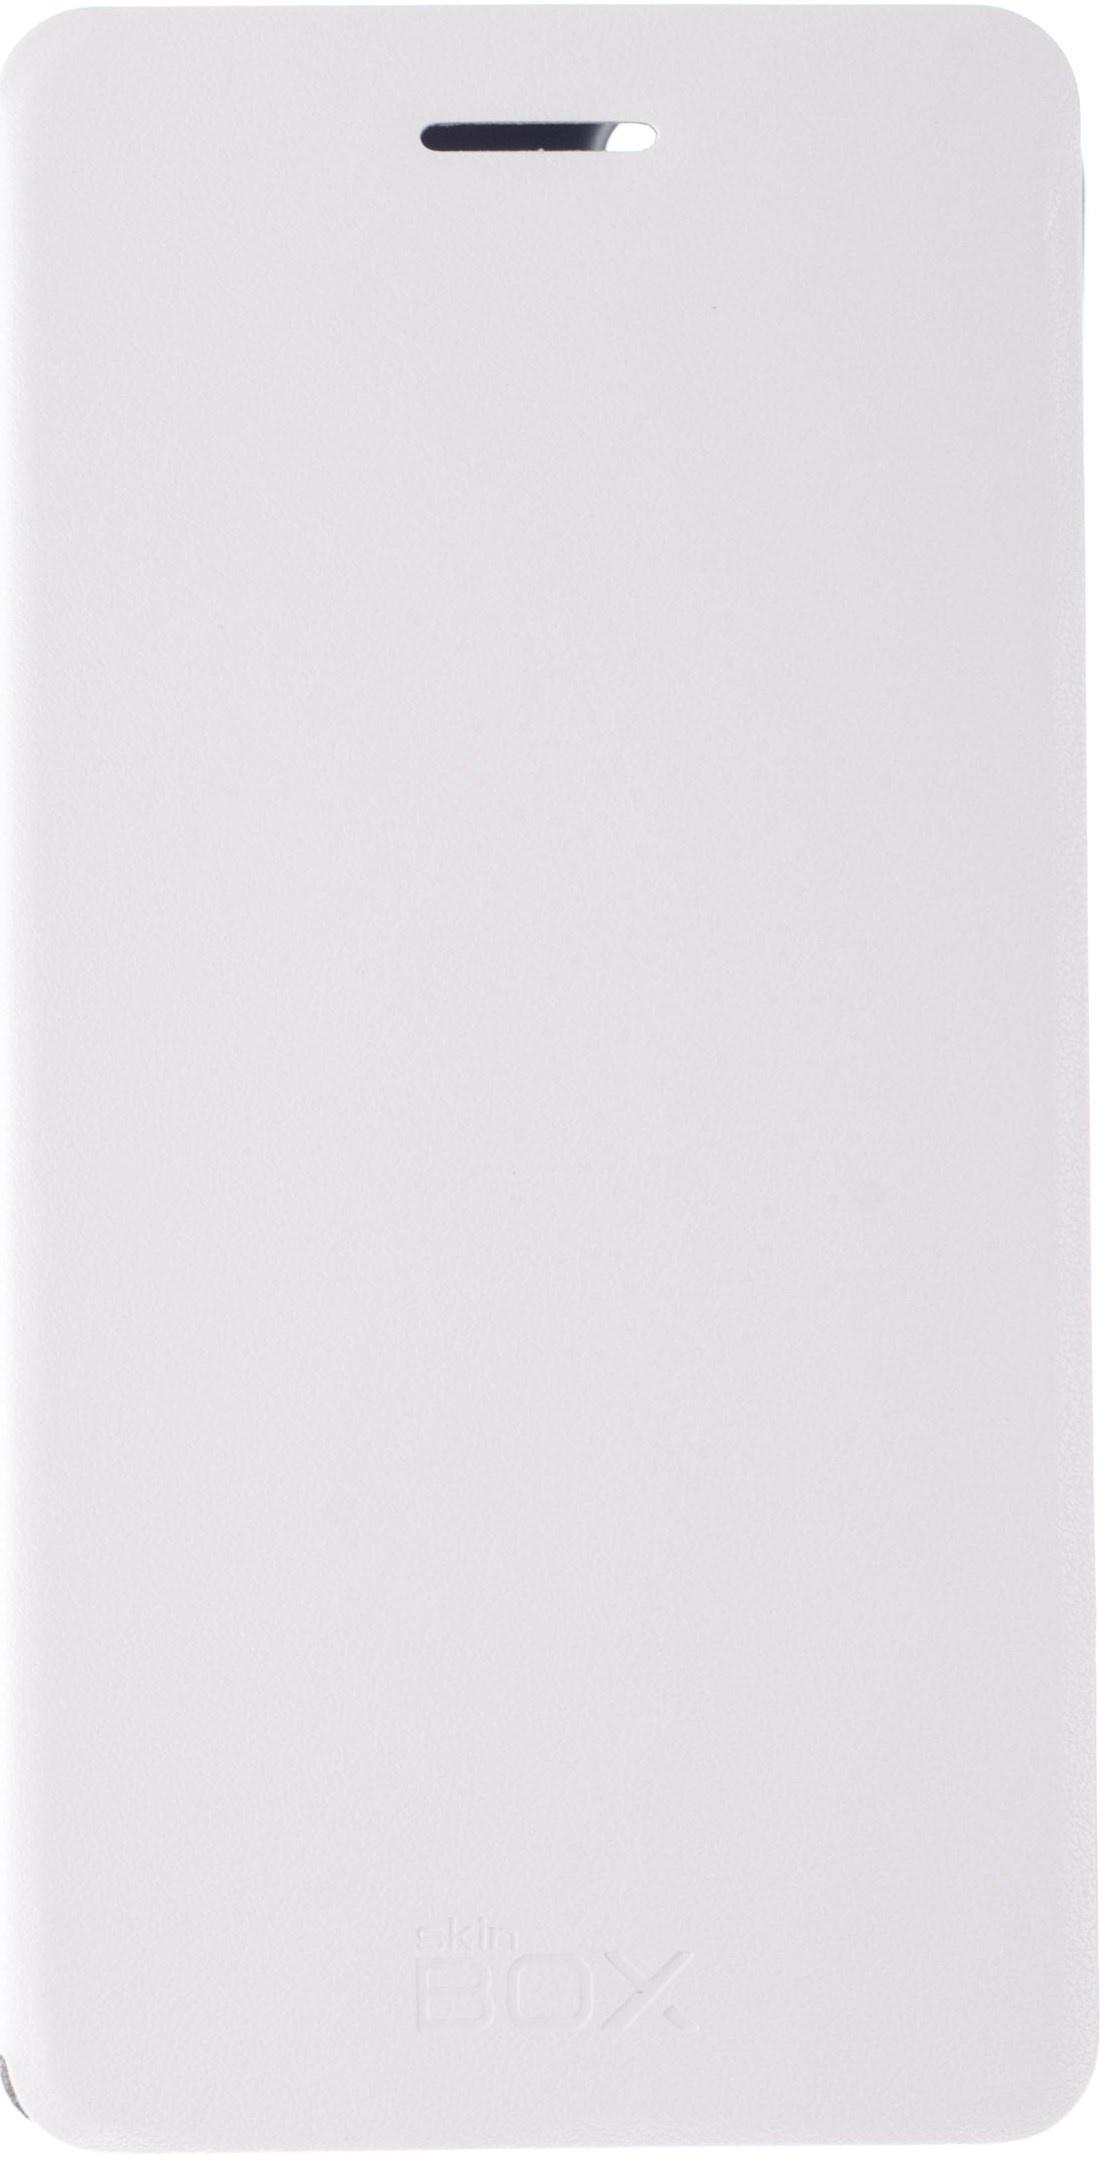 цена на Чехол для сотового телефона skinBOX Lux, 4630042525542, белый